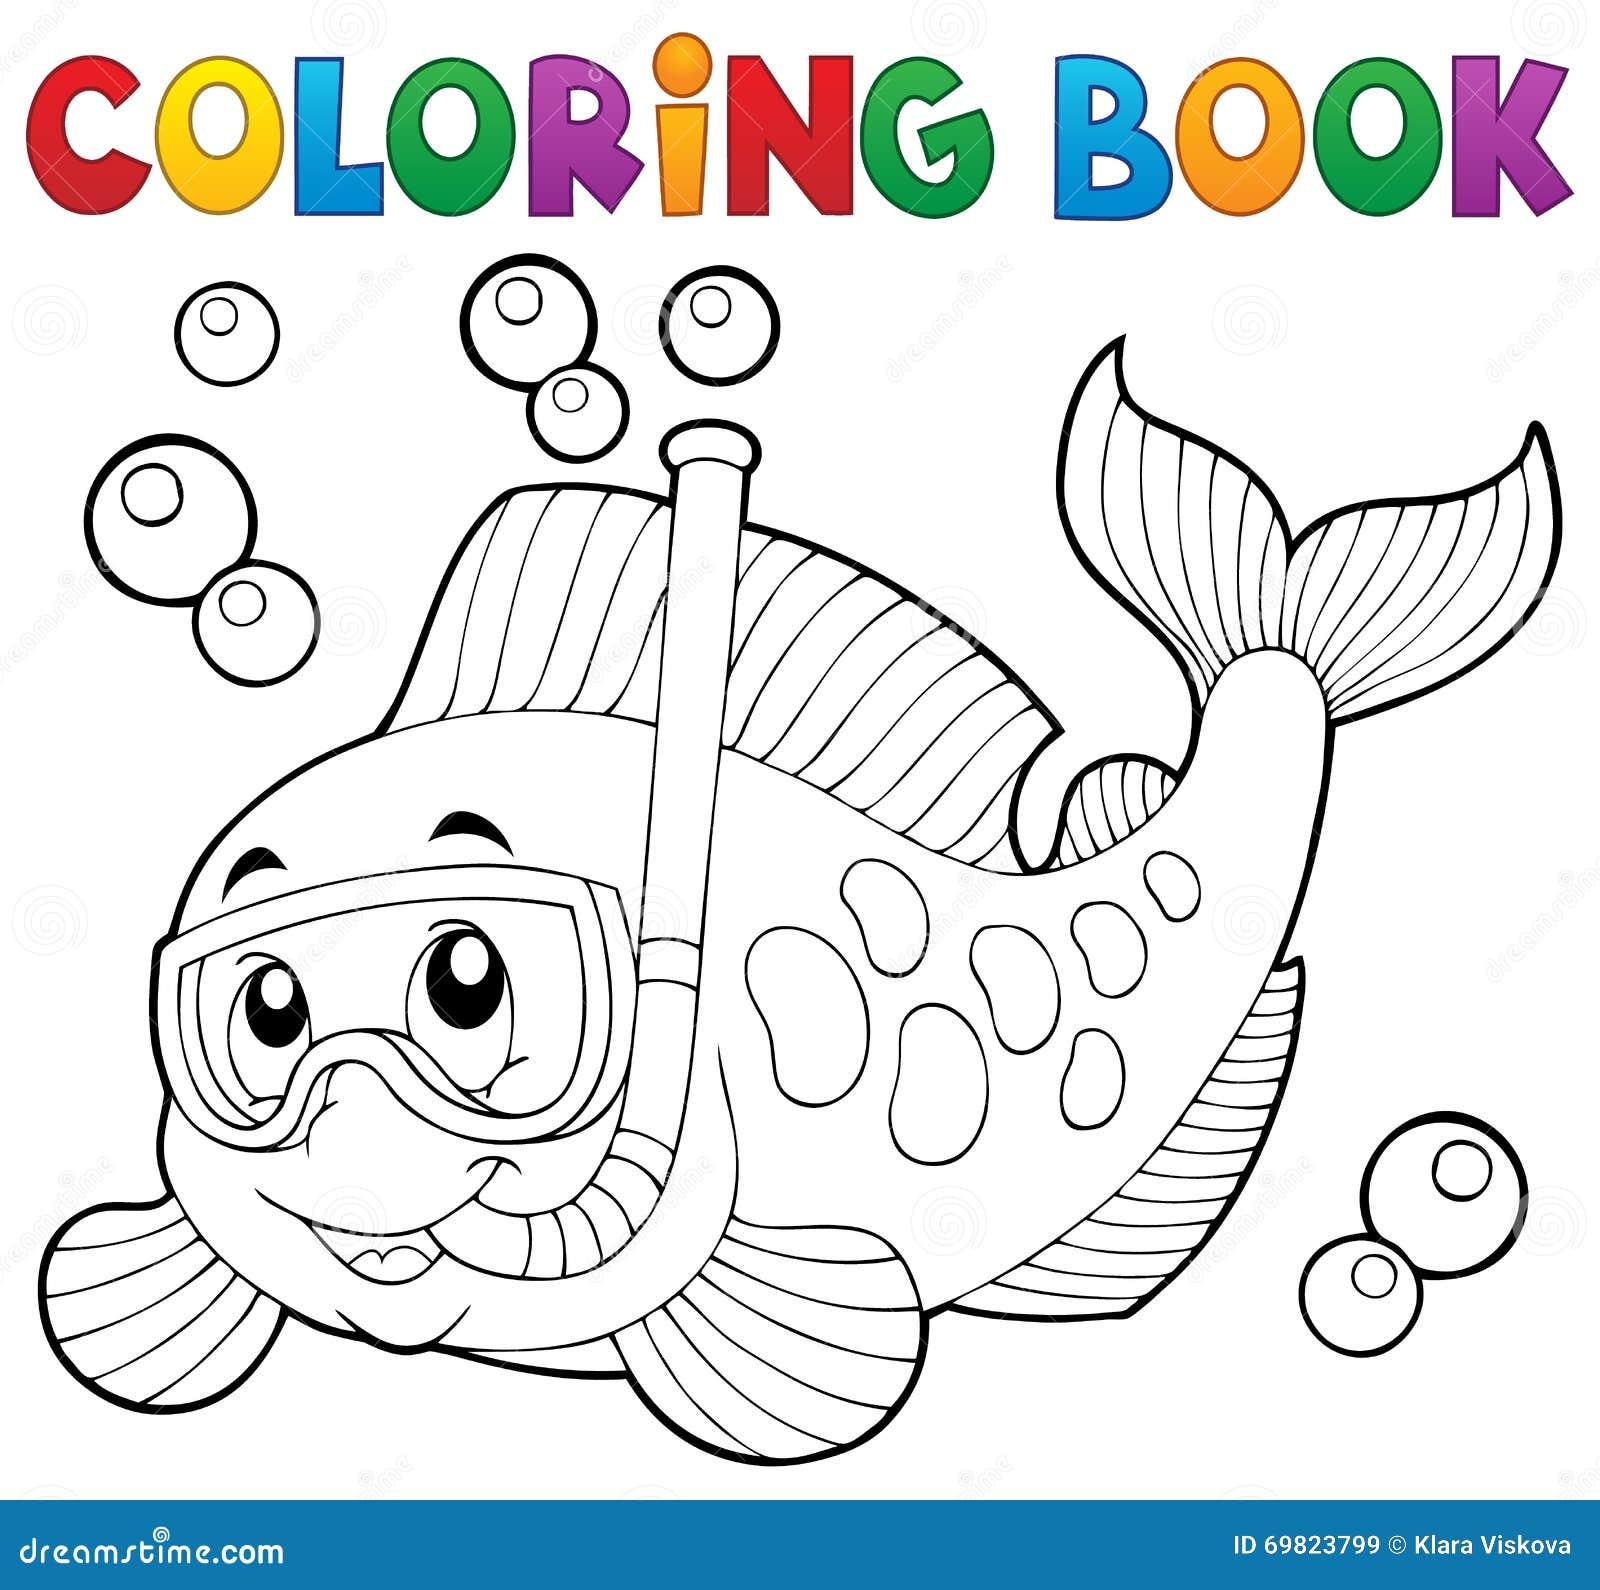 Coloring Book Fish Snorkel Diver Stock Vector - Illustration of ...